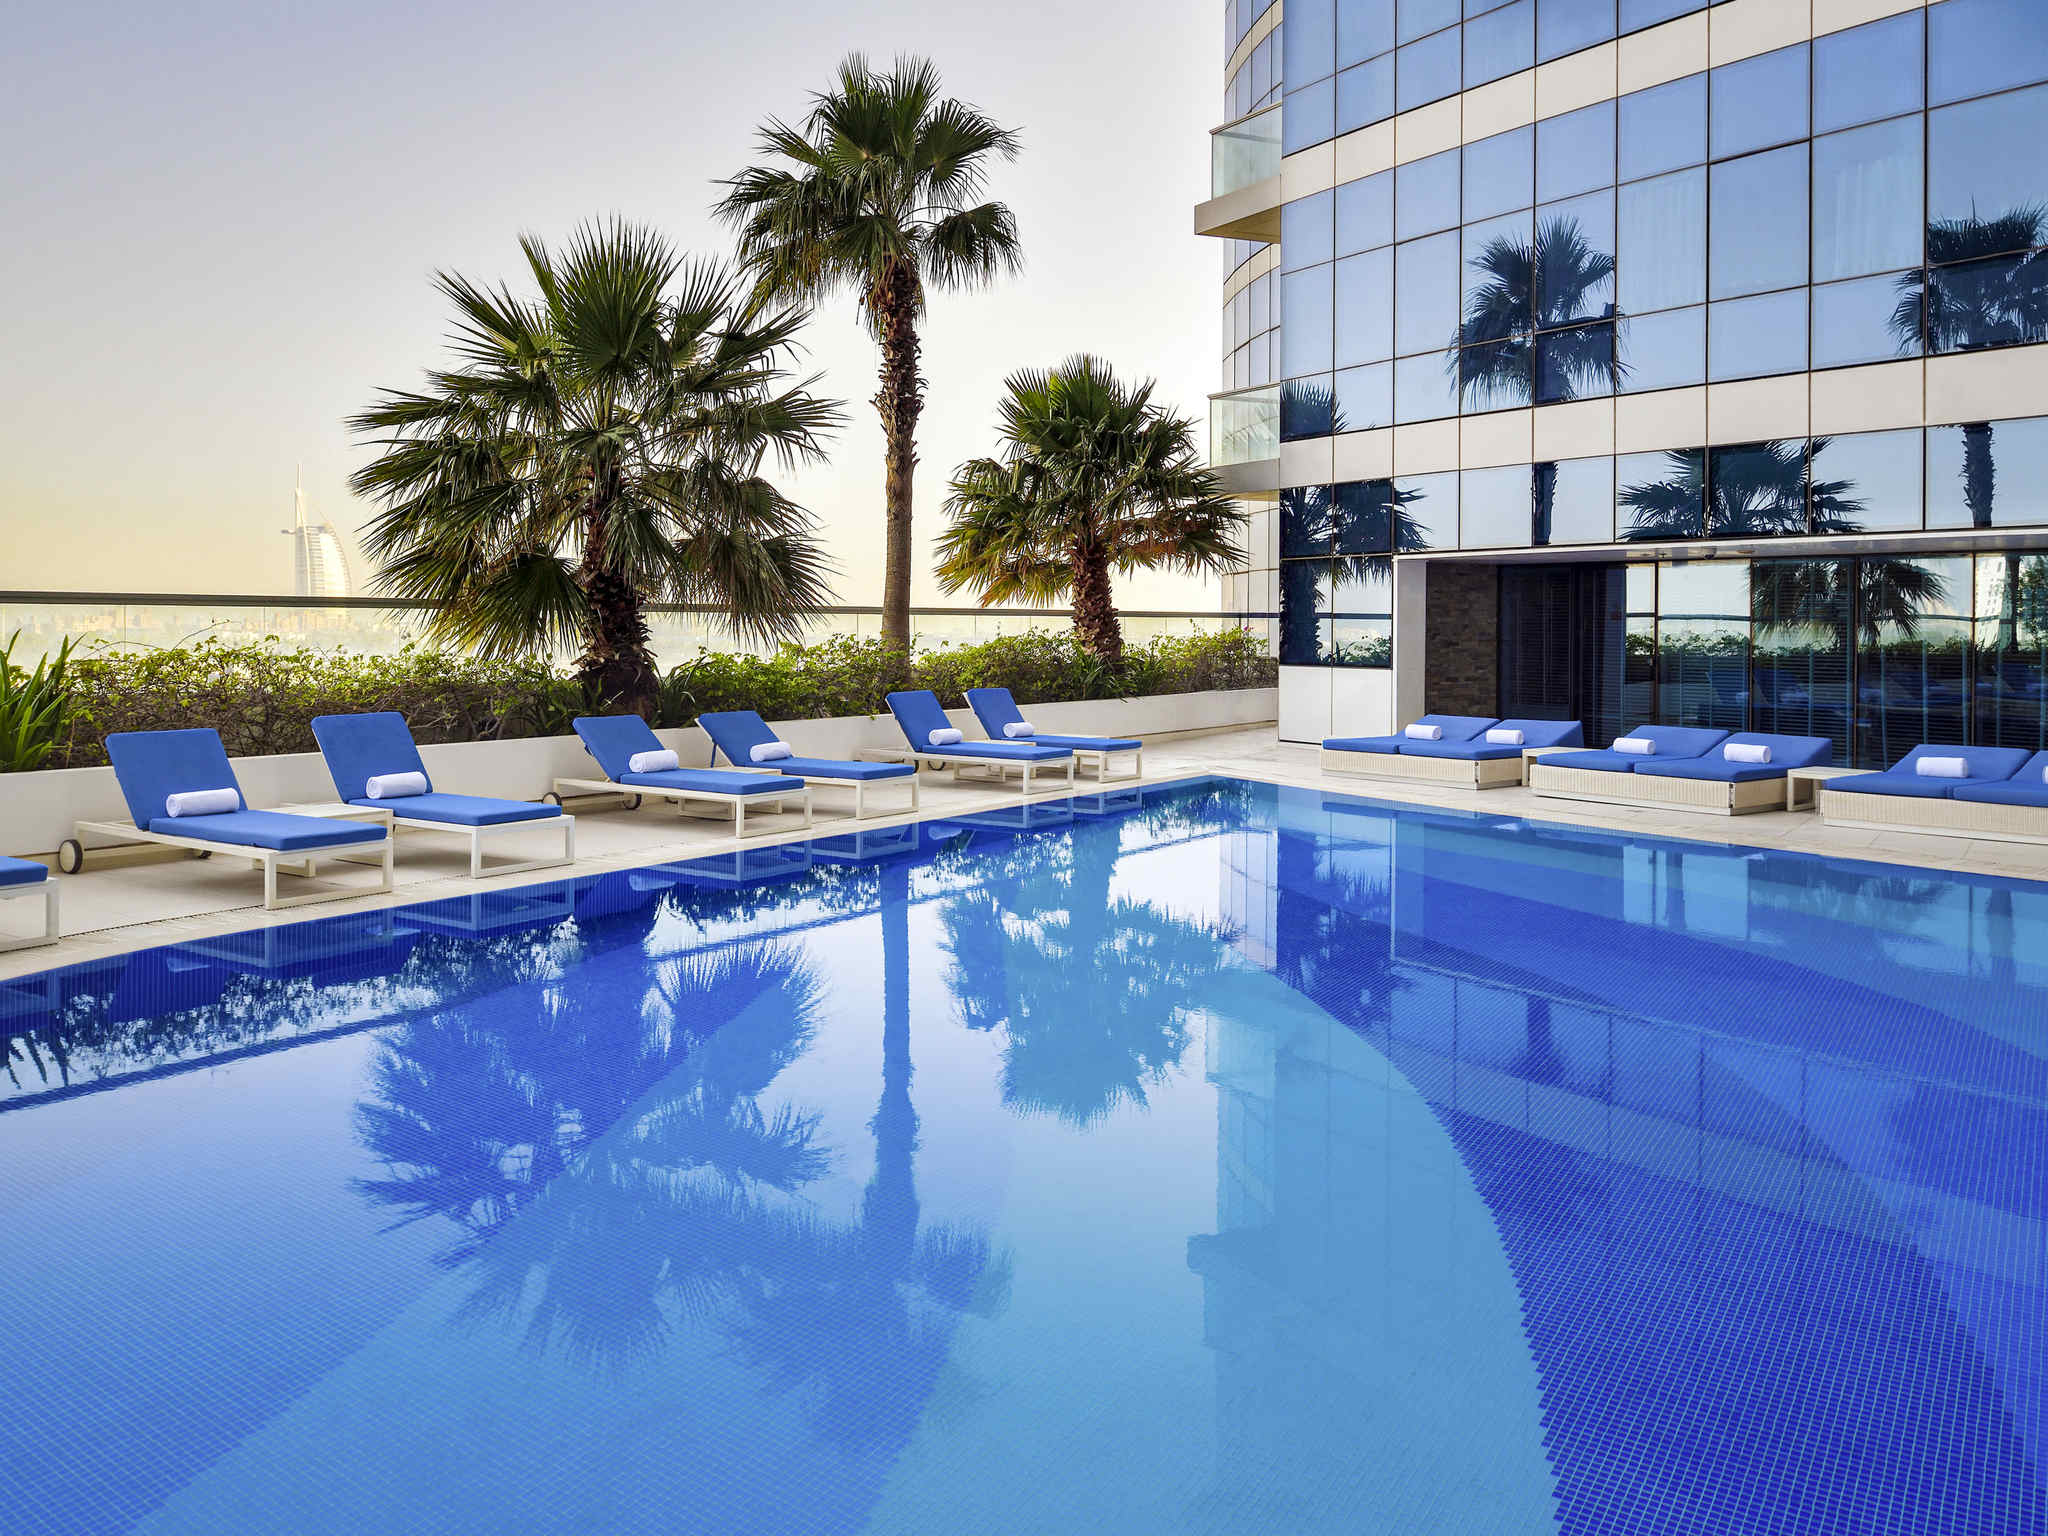 فندق - نوفوتيل Novotel دبي البرشا